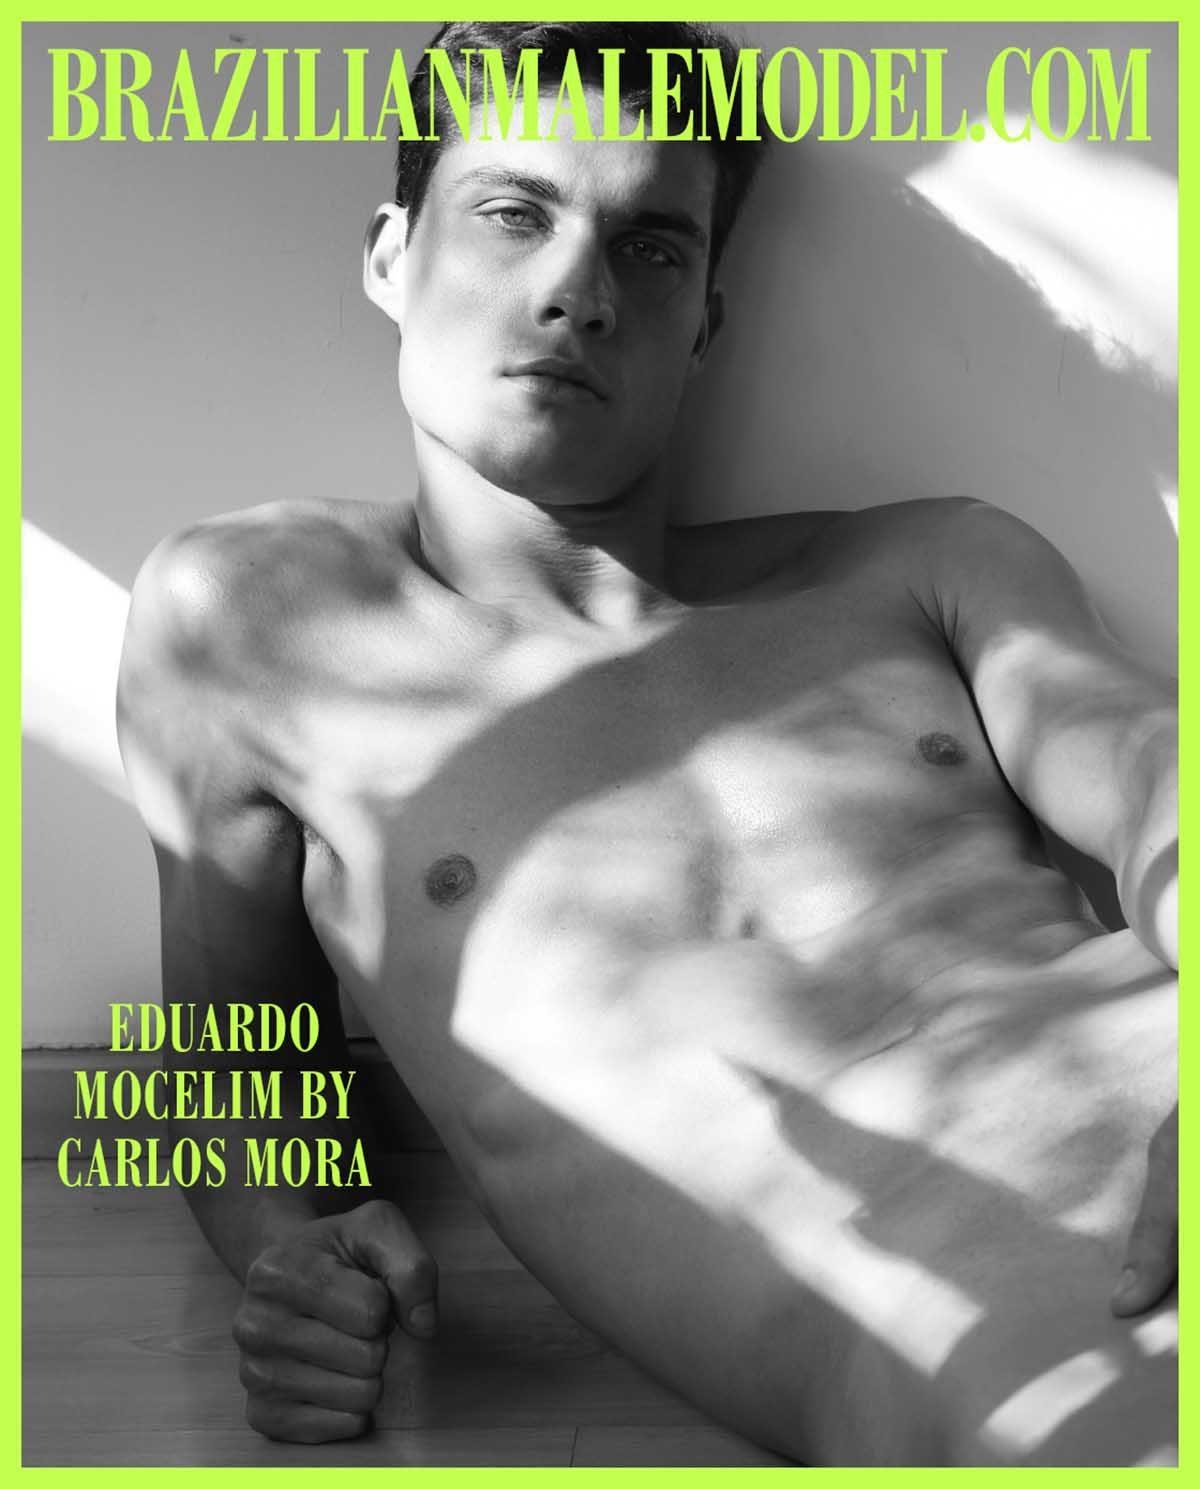 Eduardo Mocelim by Carlos Mora